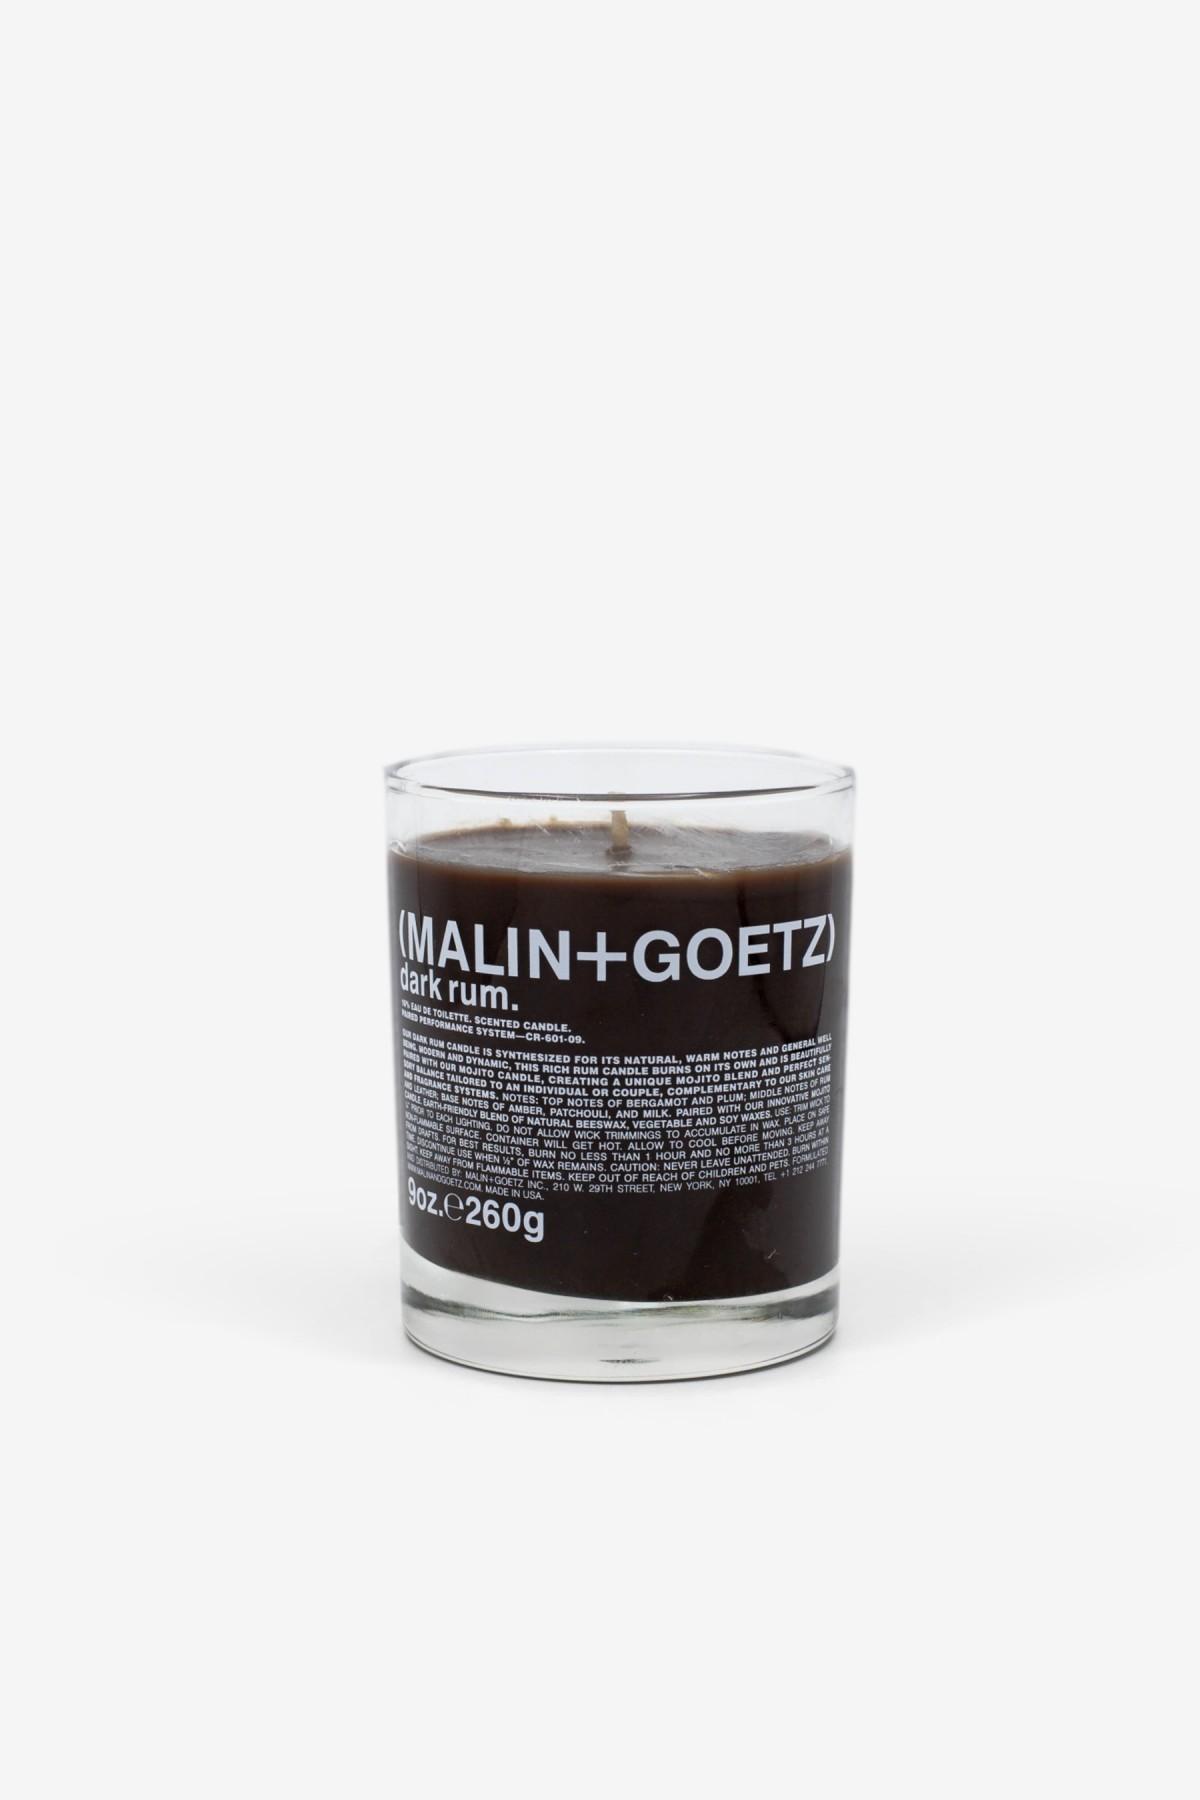 Malin+Goetz Dark Rum Candle 260gr in